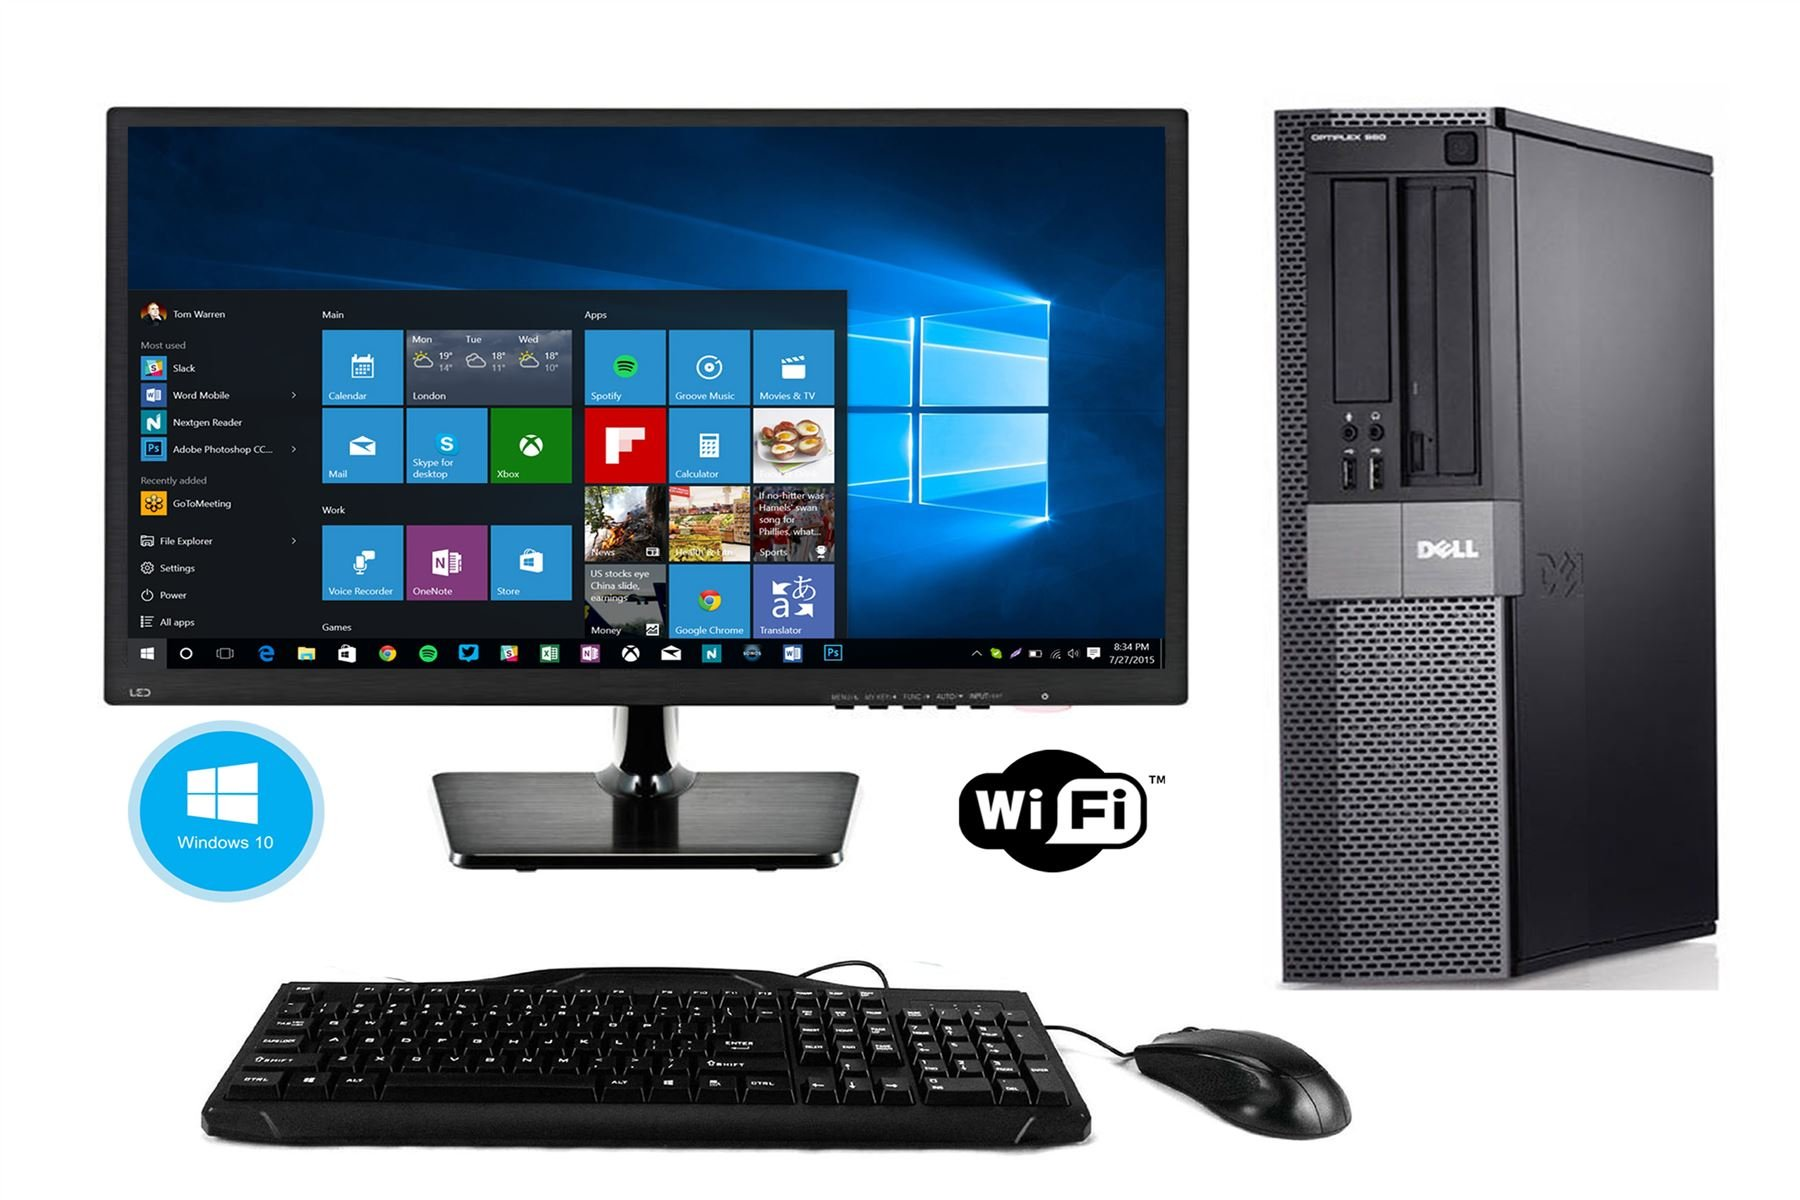 Fast Dell Optiplex 980 Desktop Computer Windows 10 PC Intel Core i5 4gb 250GB